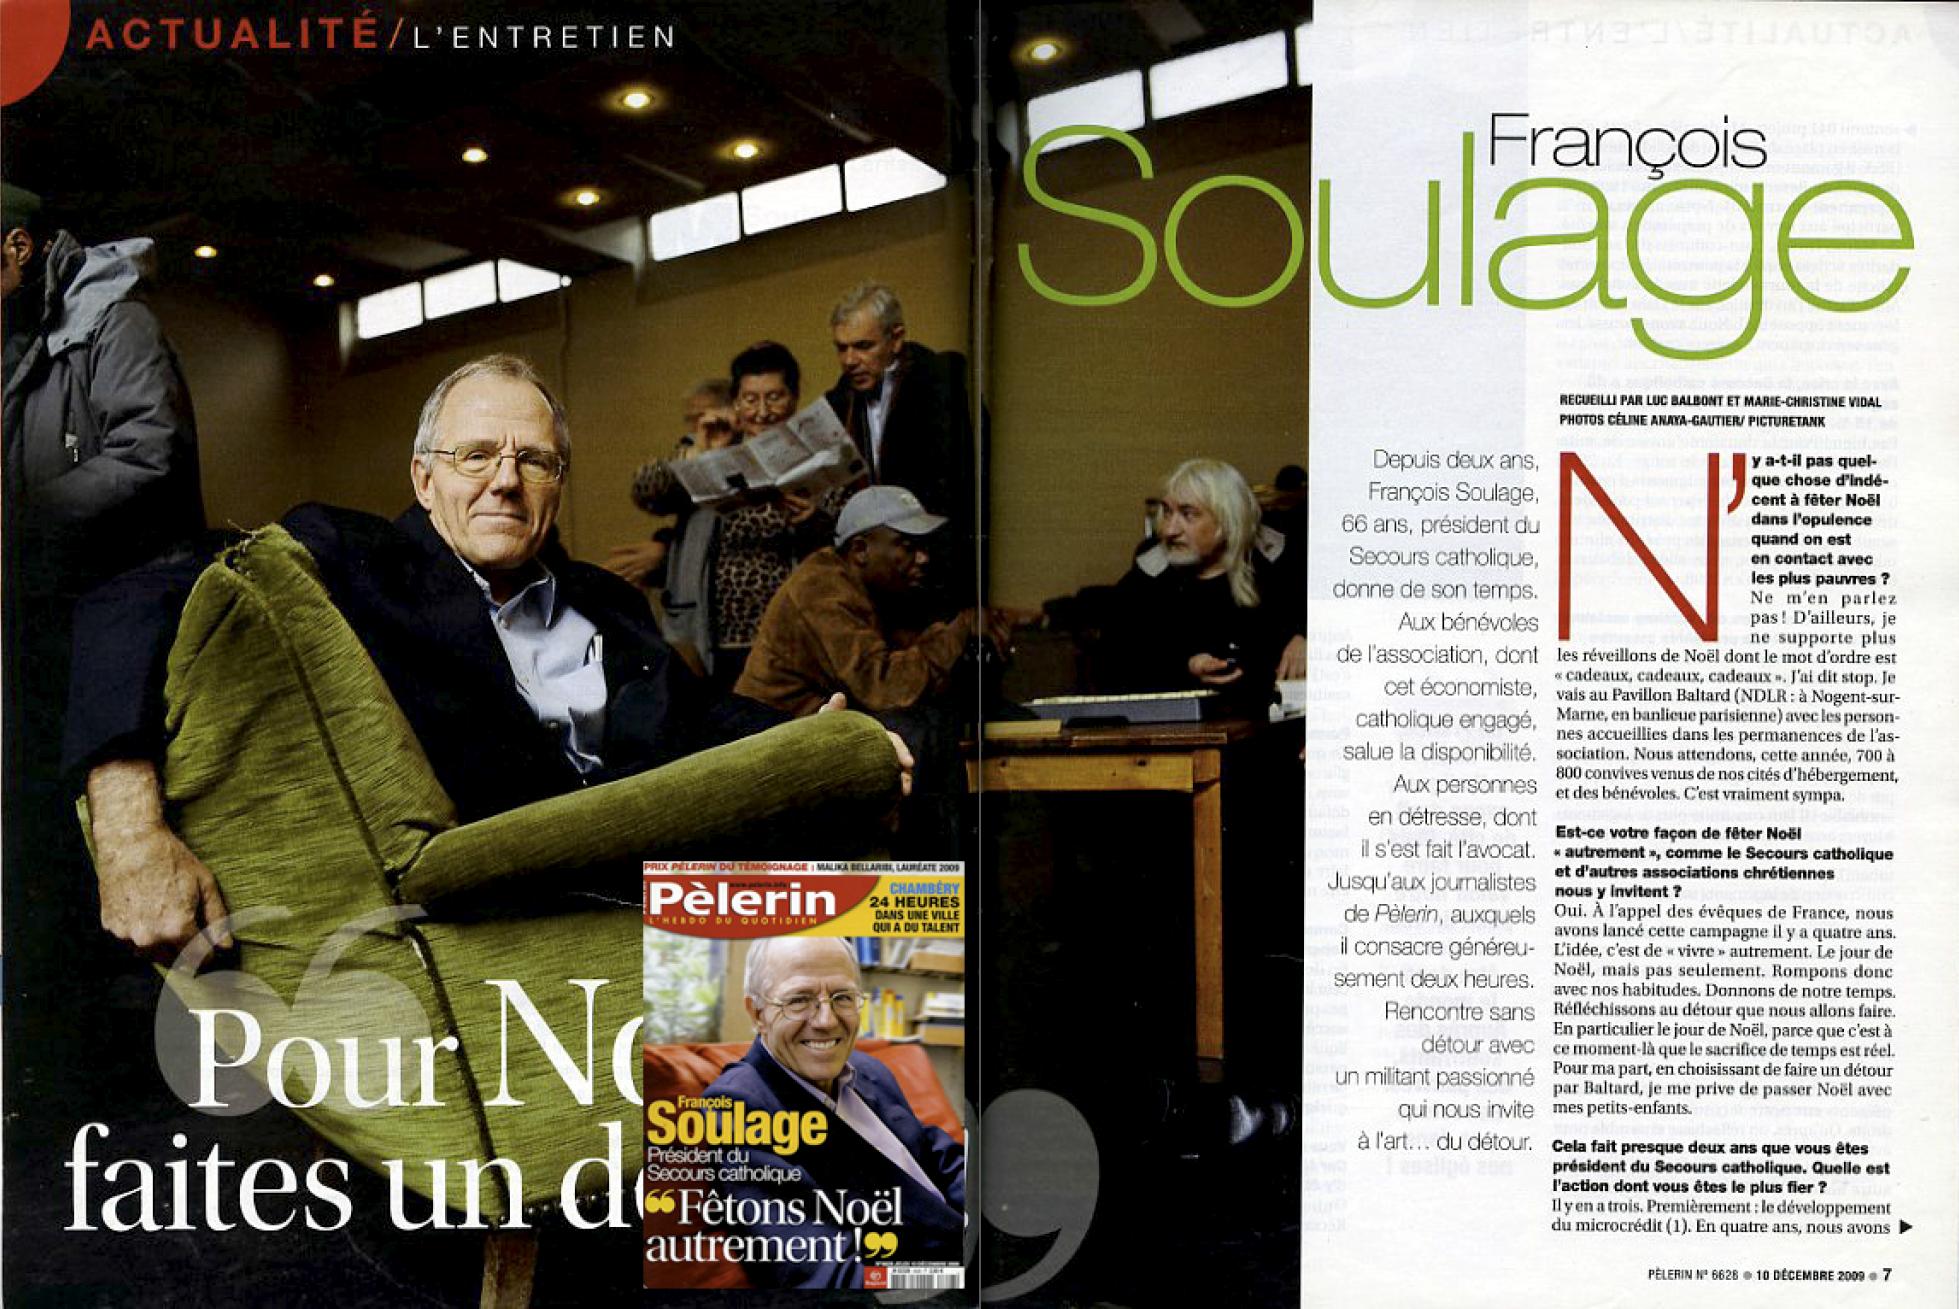 François Soulage